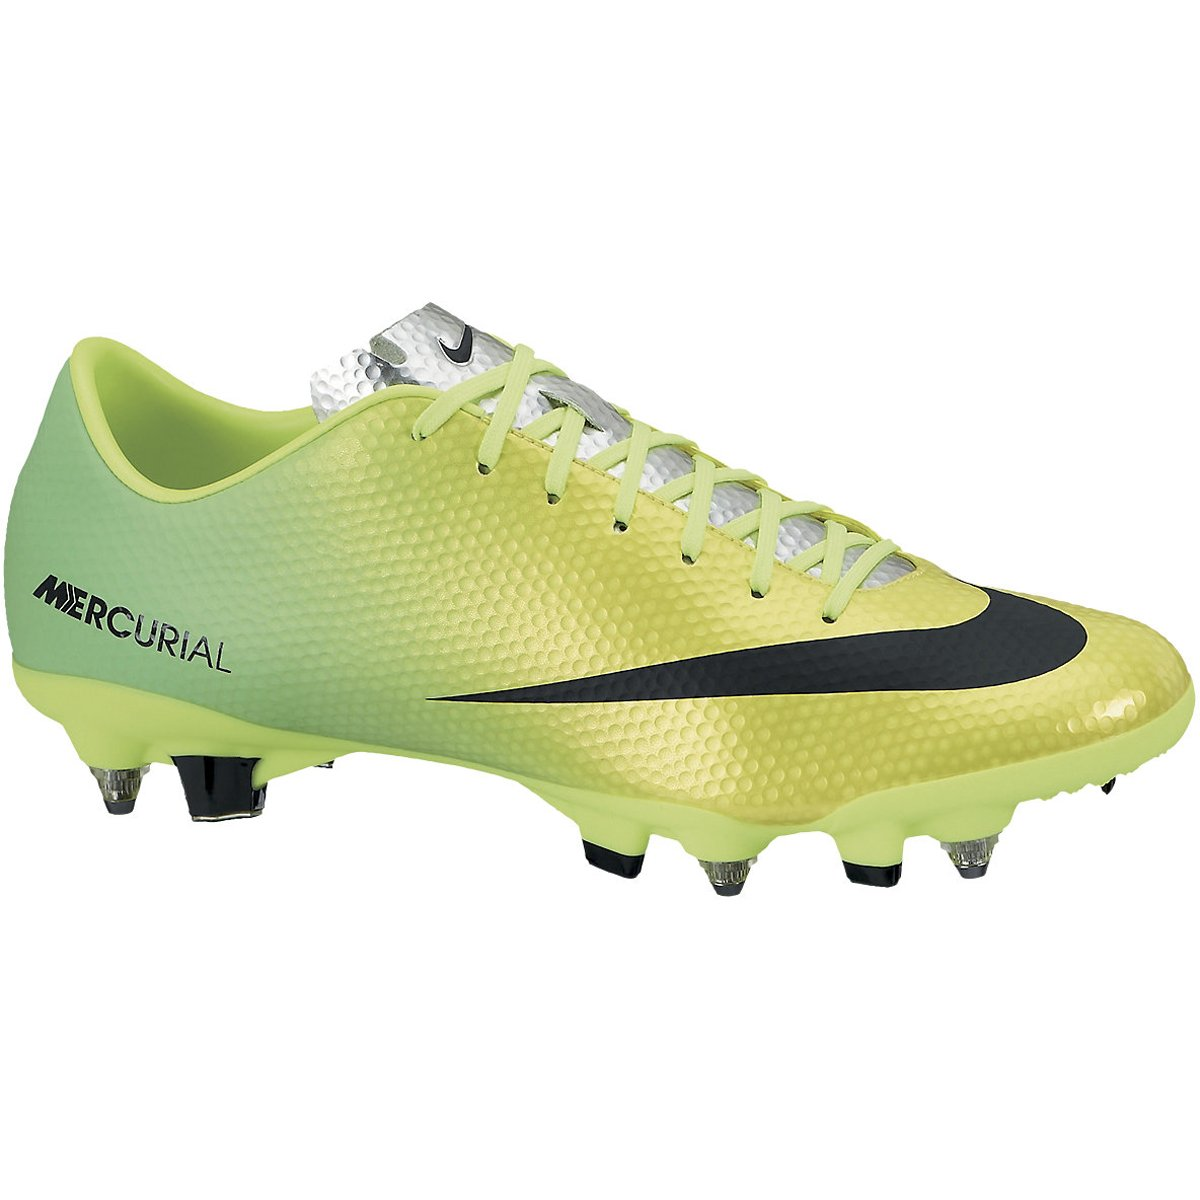 Chuteira Nike Mercurial Veloce SG Pro - Compre Agora  d5f28d4009c6a